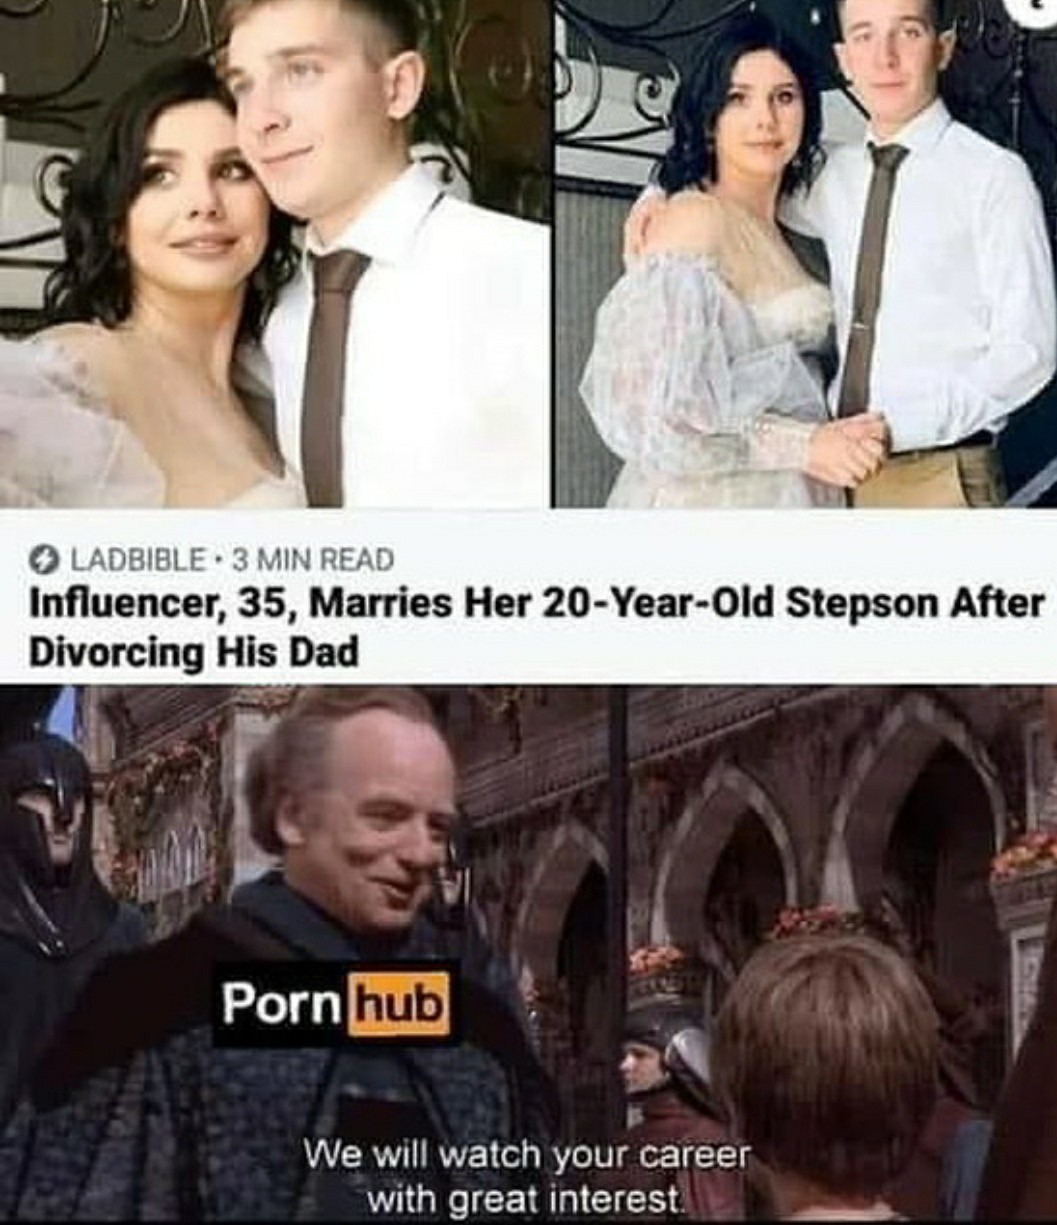 It's happening - meme